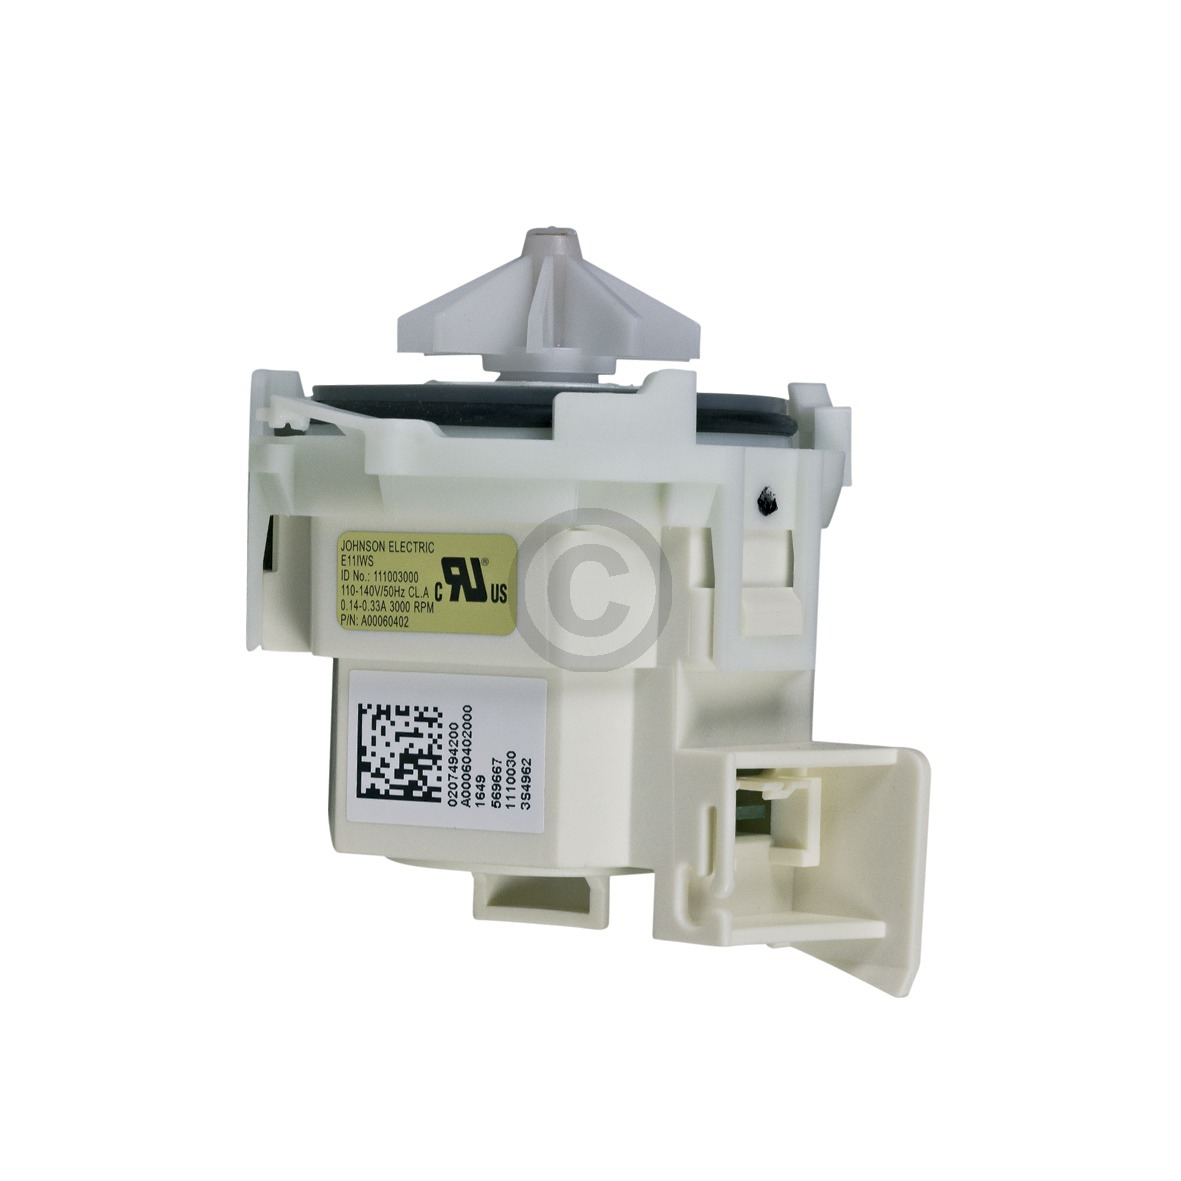 Ablaufpumpe Solo Pumpenmotor Bajonettbefestigung AEG 14000060401/1 Original